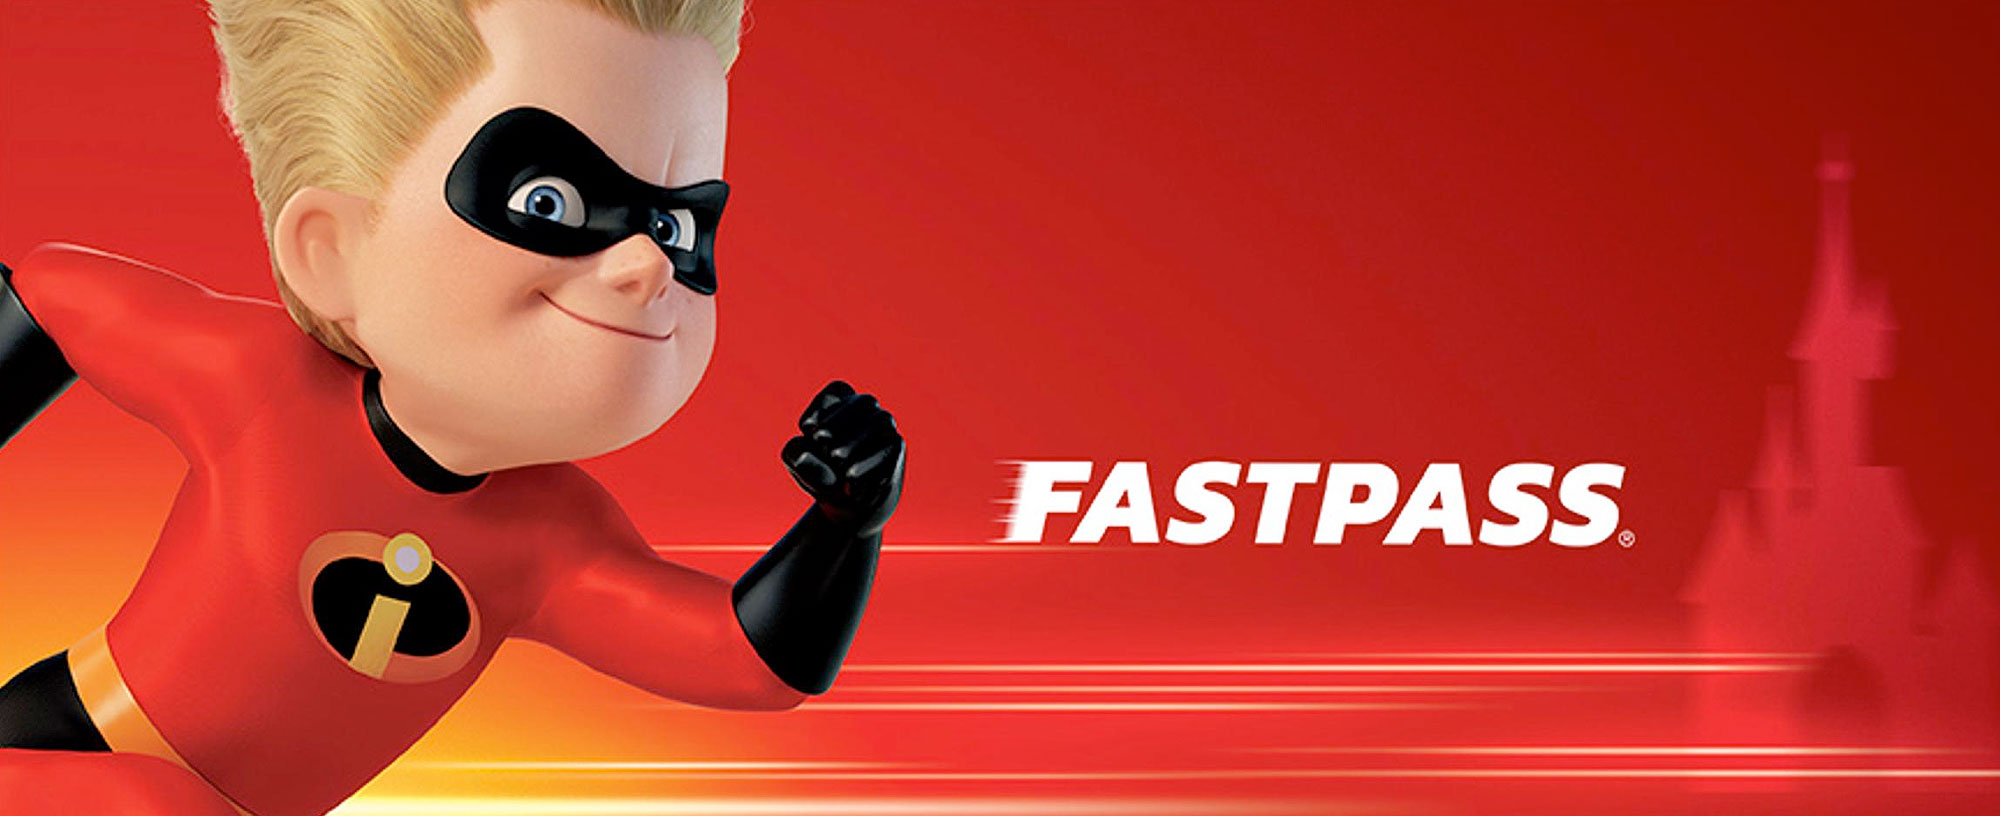 Speedy Access - Fastpass Range